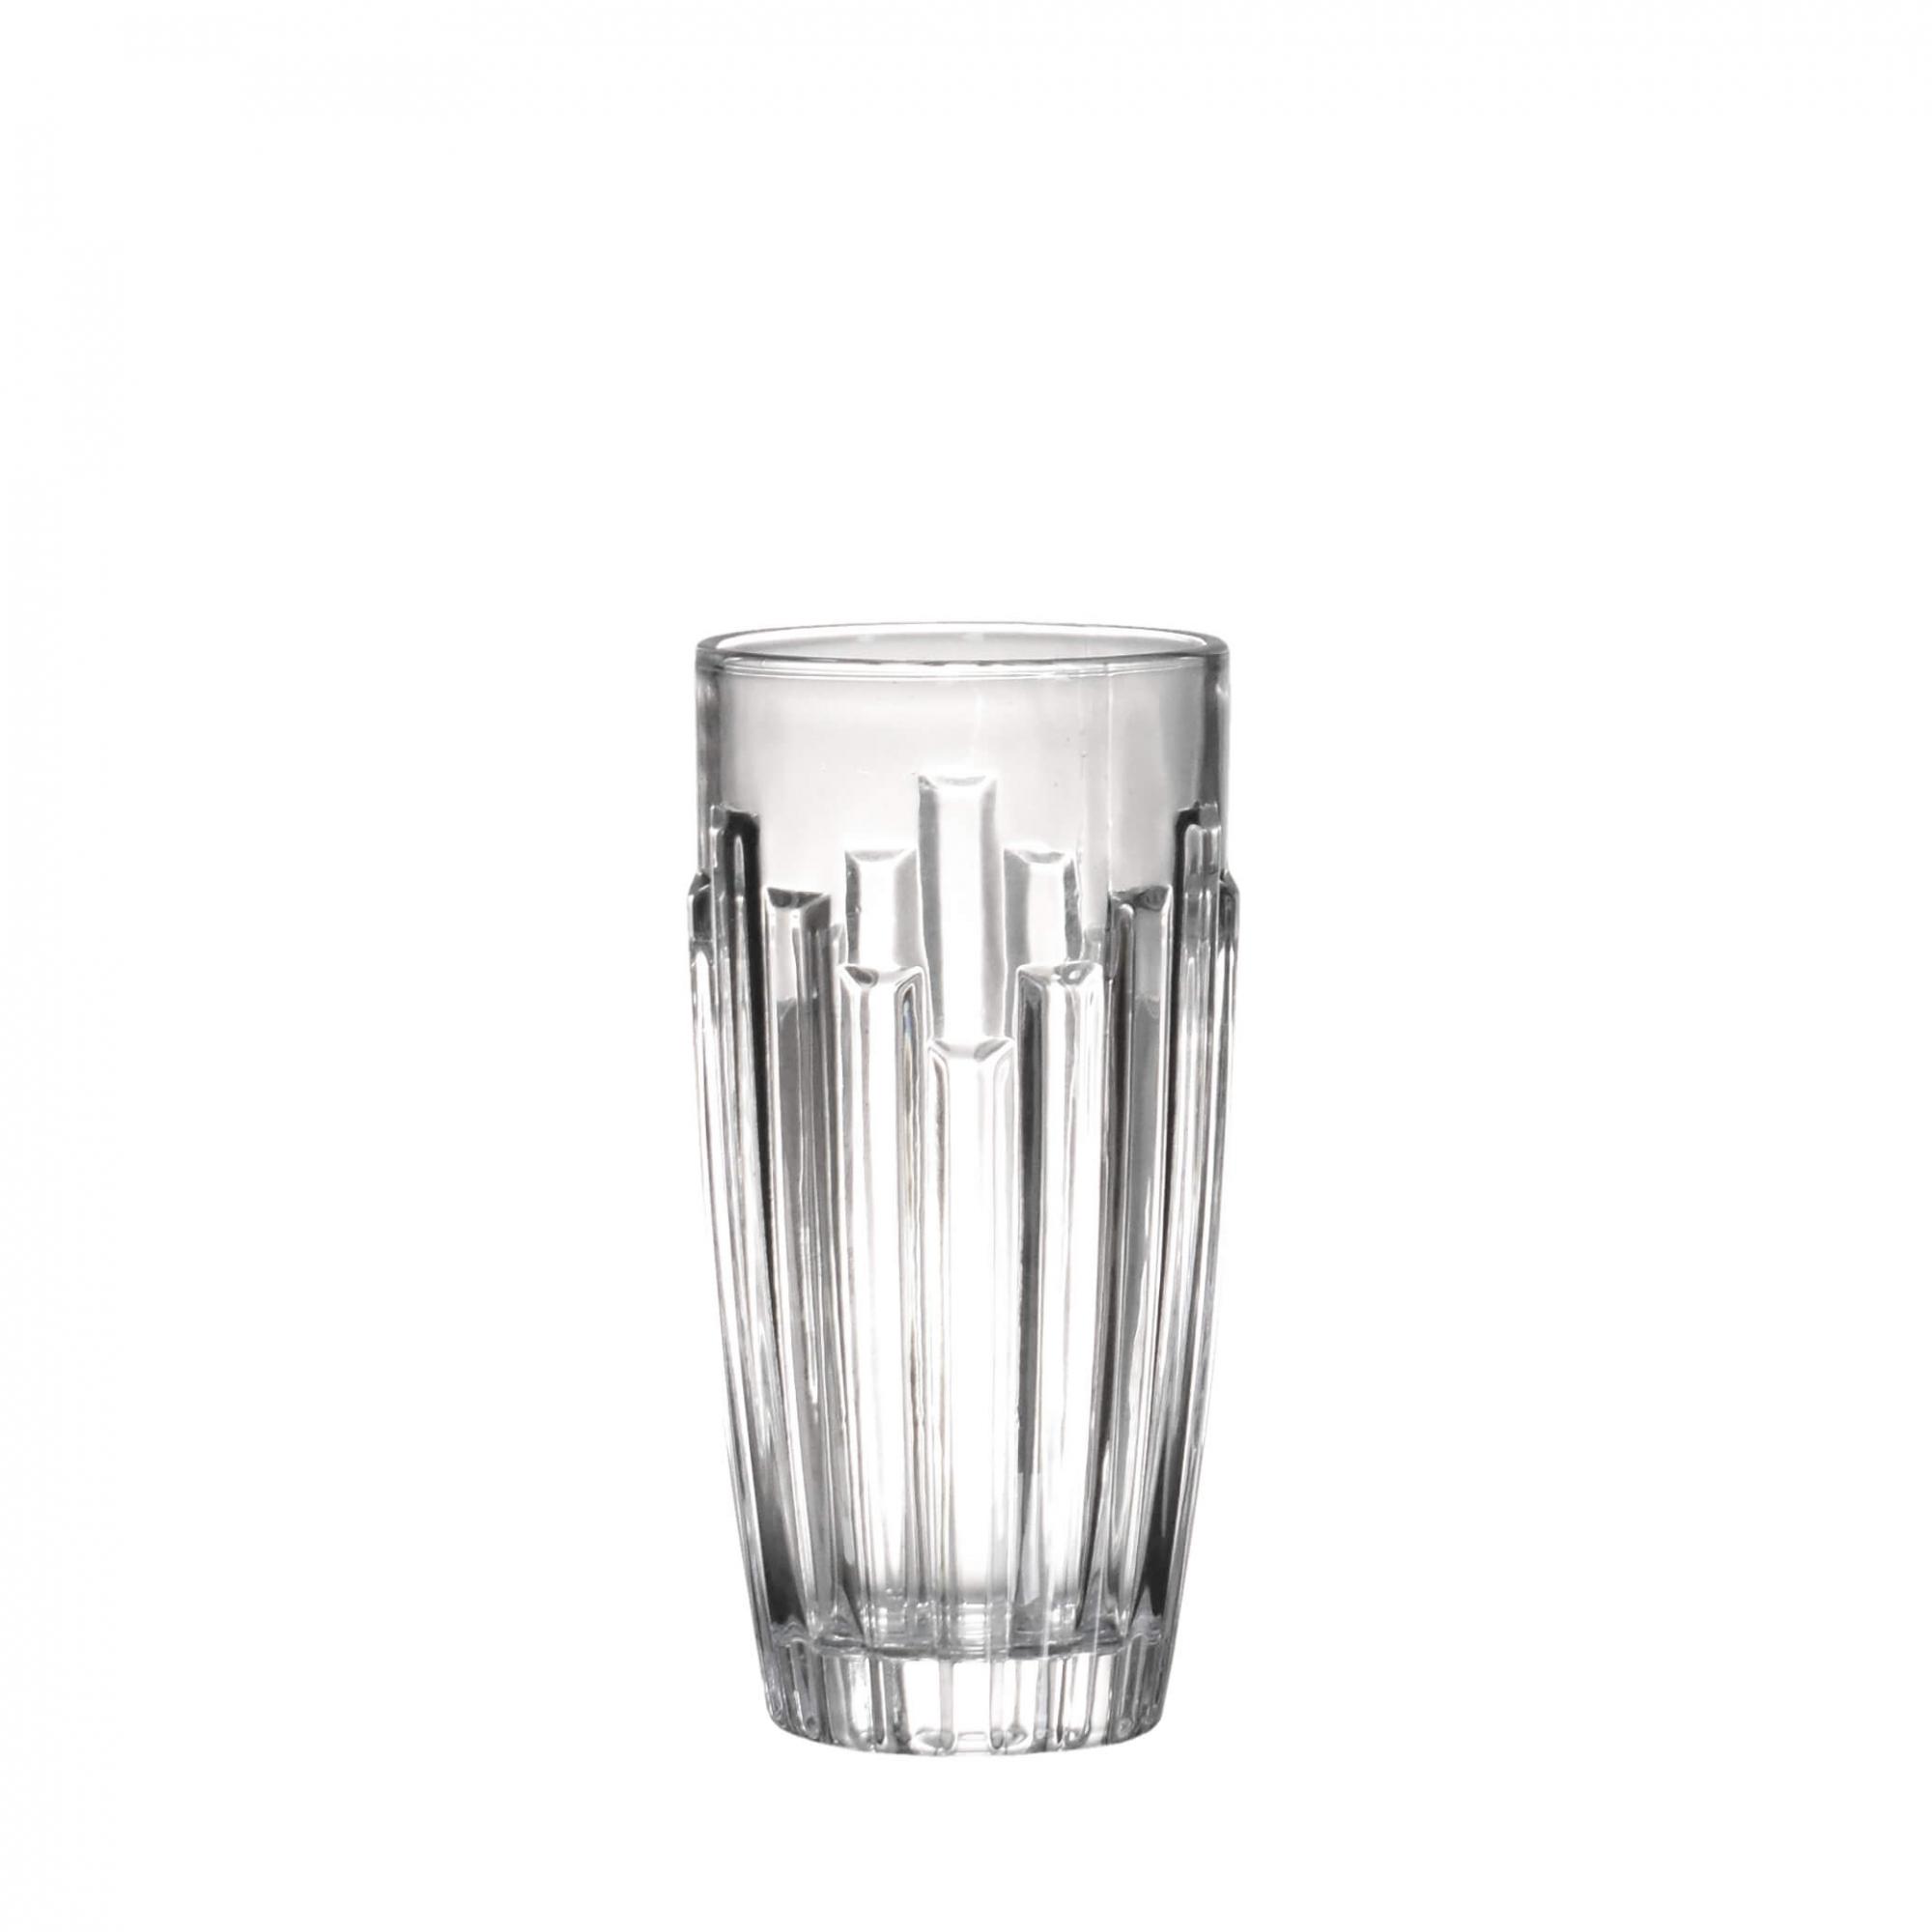 Vasinho de Cristal Toyama 15 Cm